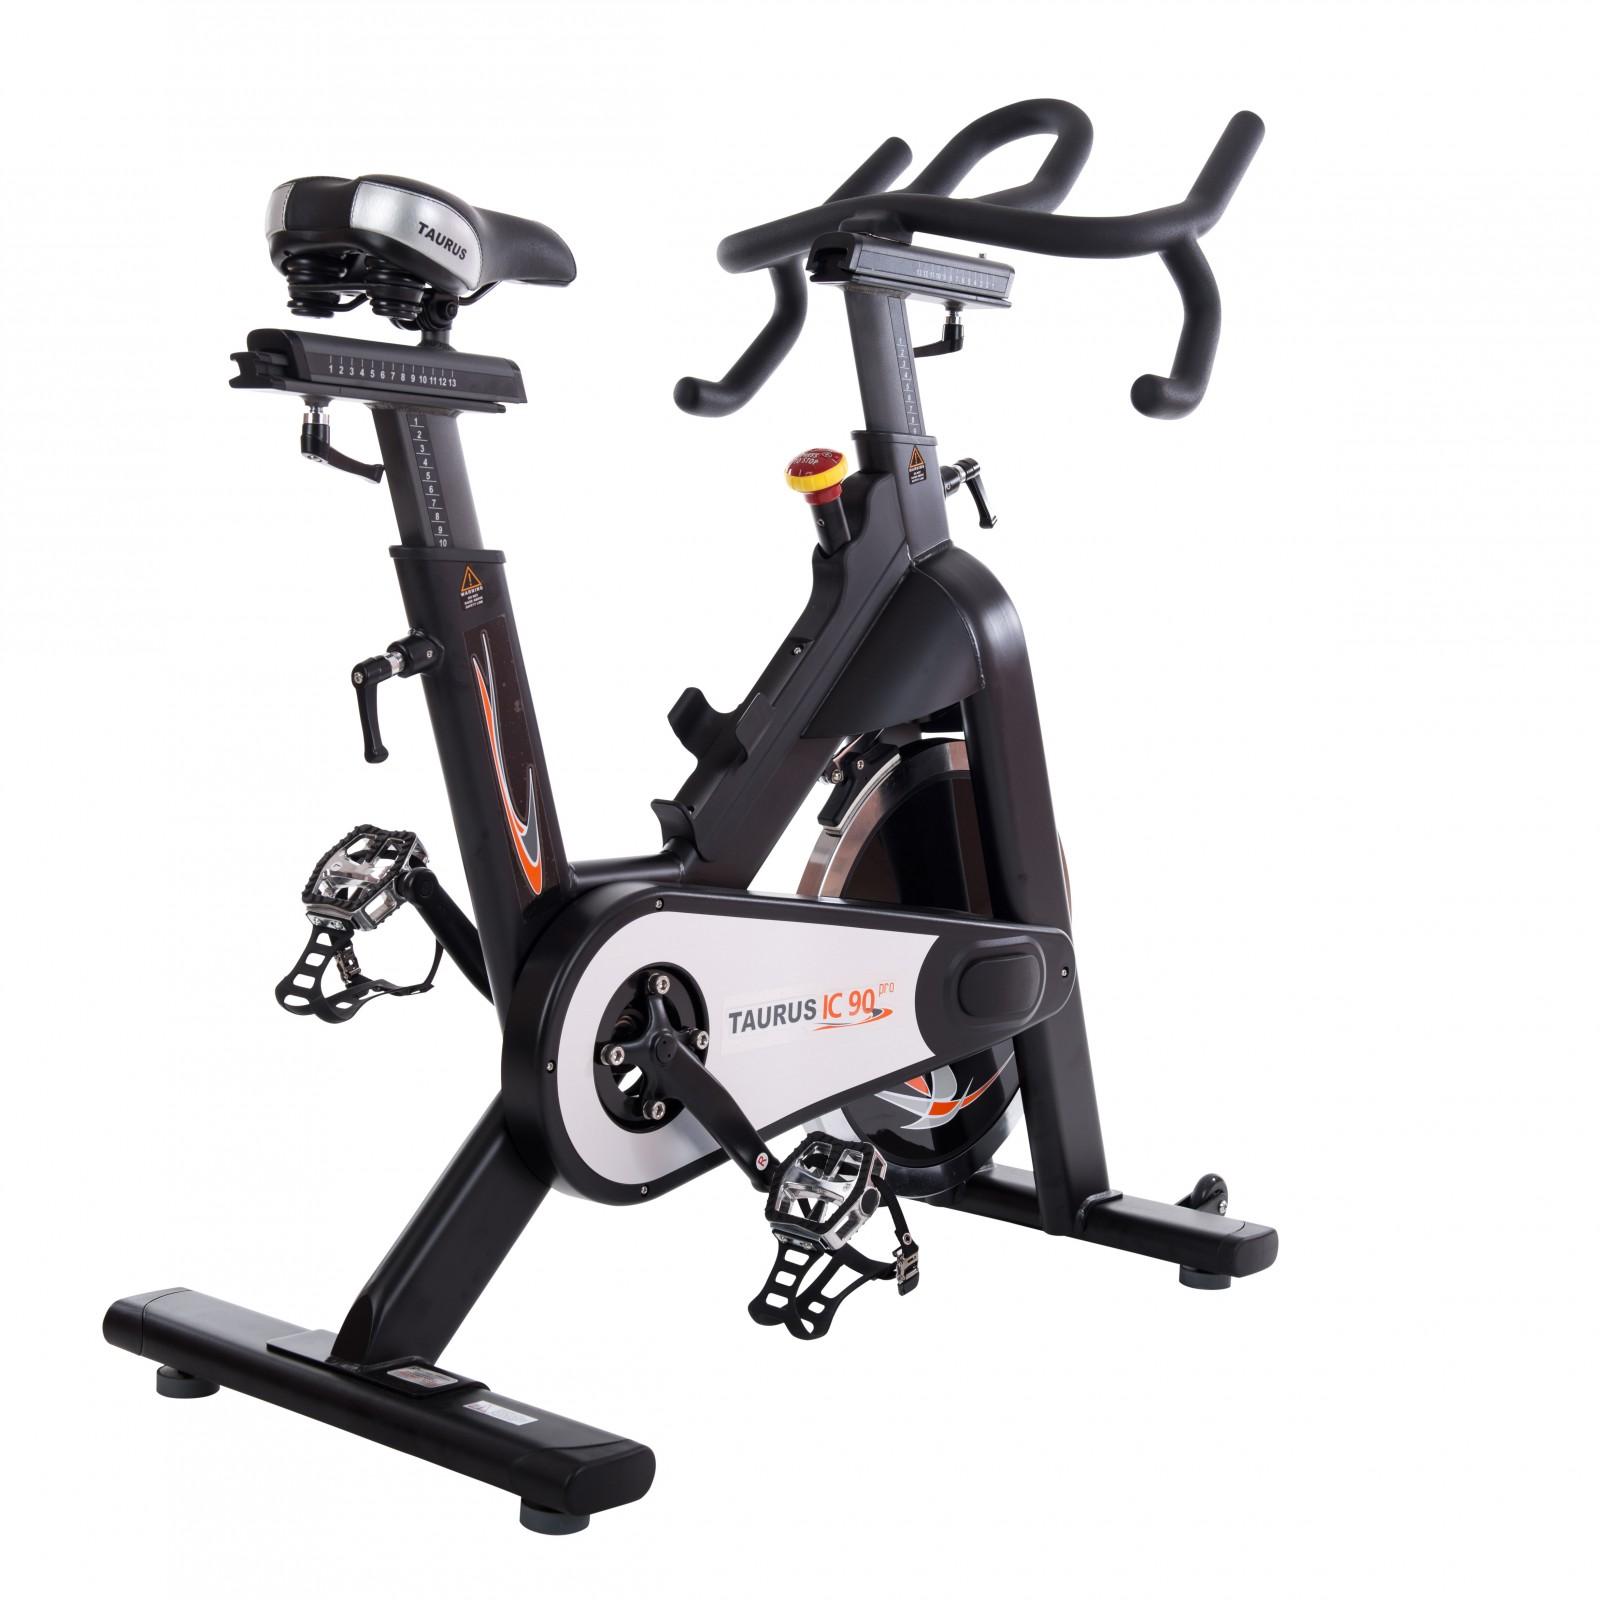 Taurus indoor bike IC90 Pro buy with 105 customer ratings - Sport-Tiedje